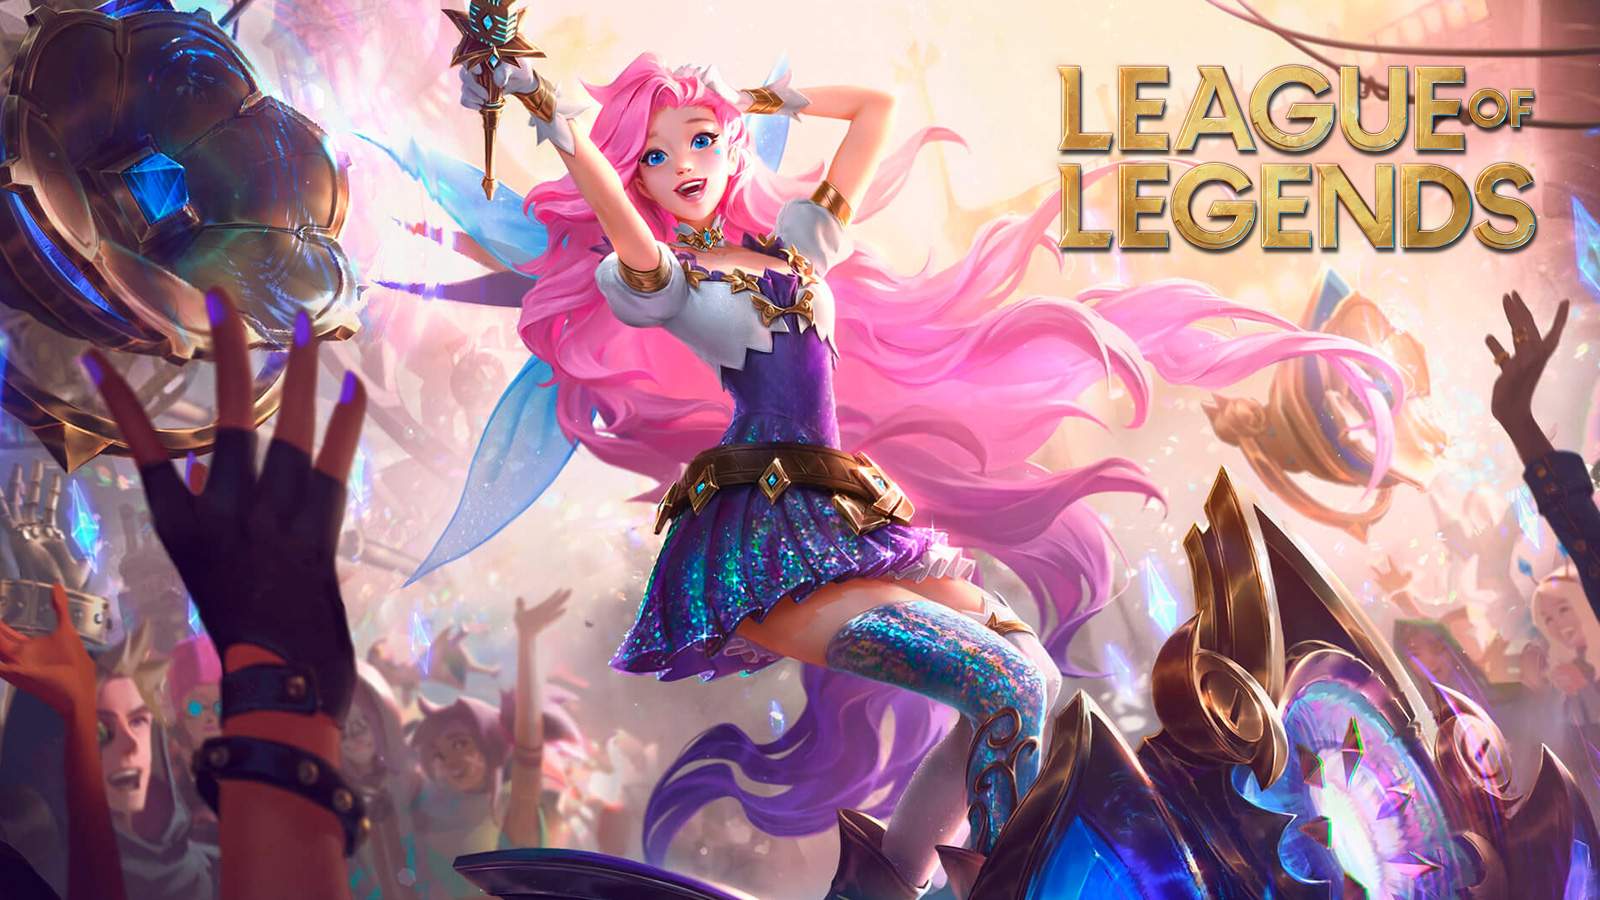 Seraphine League of Legends